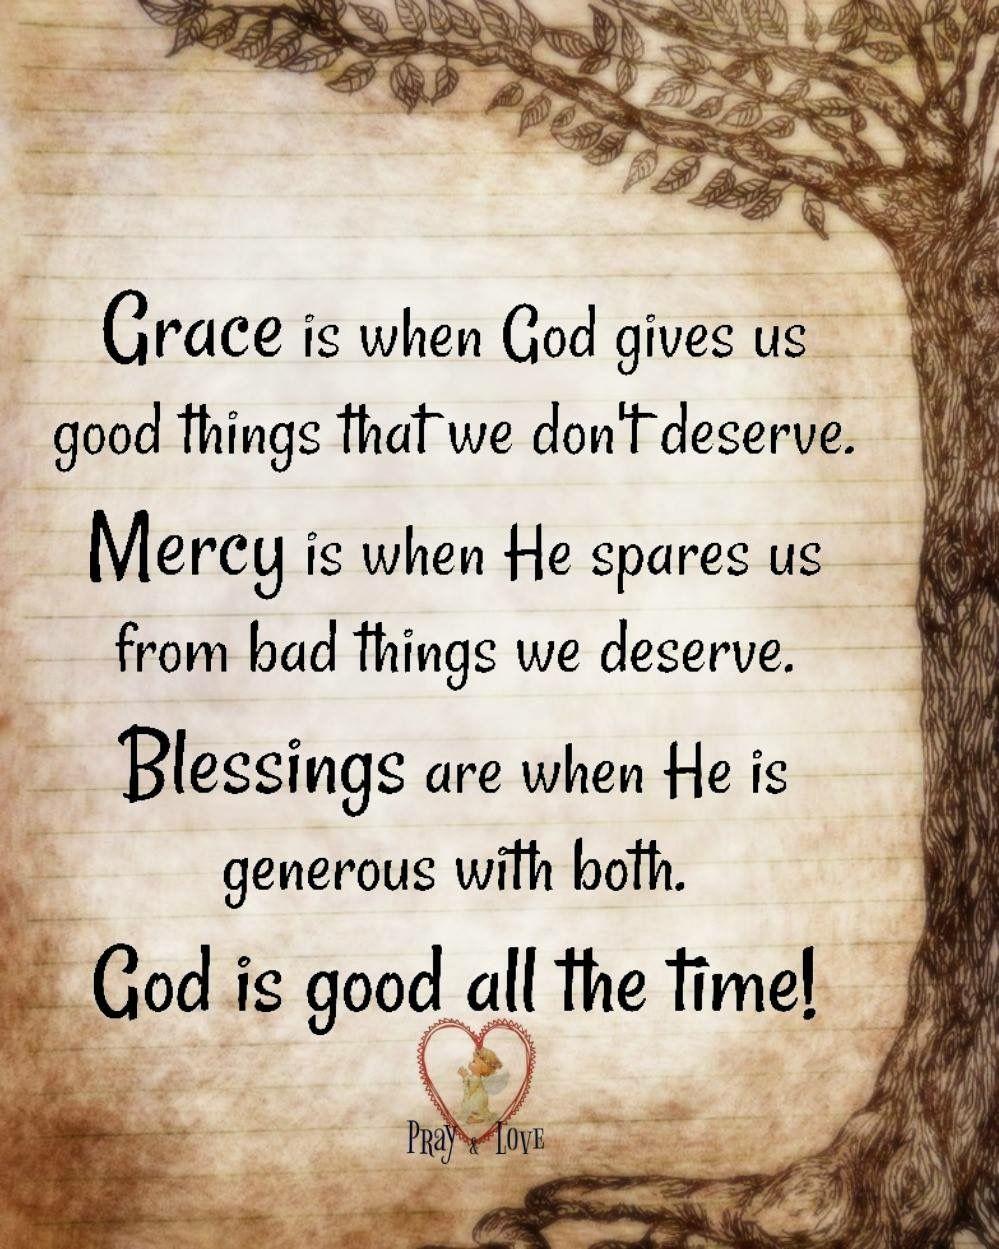 grace/mercy/blessings | lds grace | pinterest | god, prayers and faith